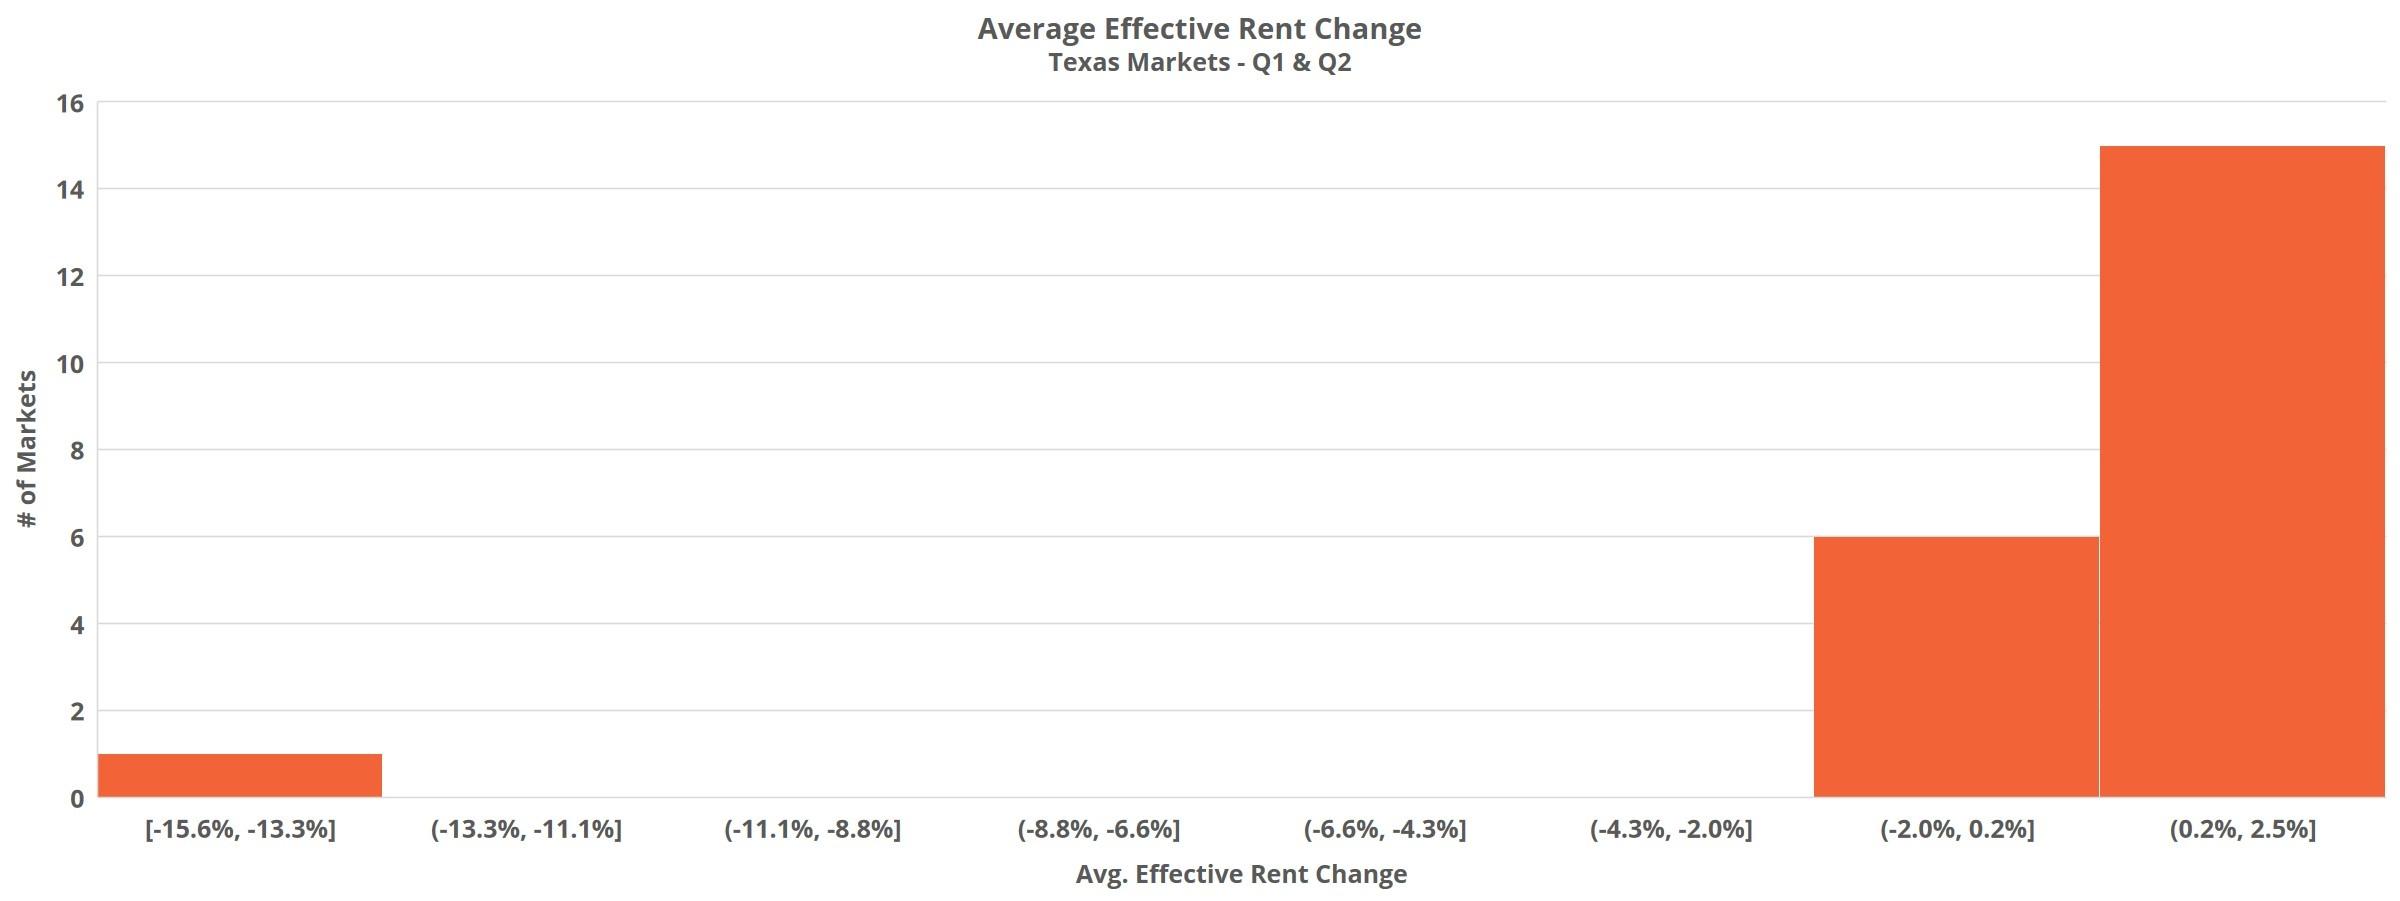 Average Effective Rent Change